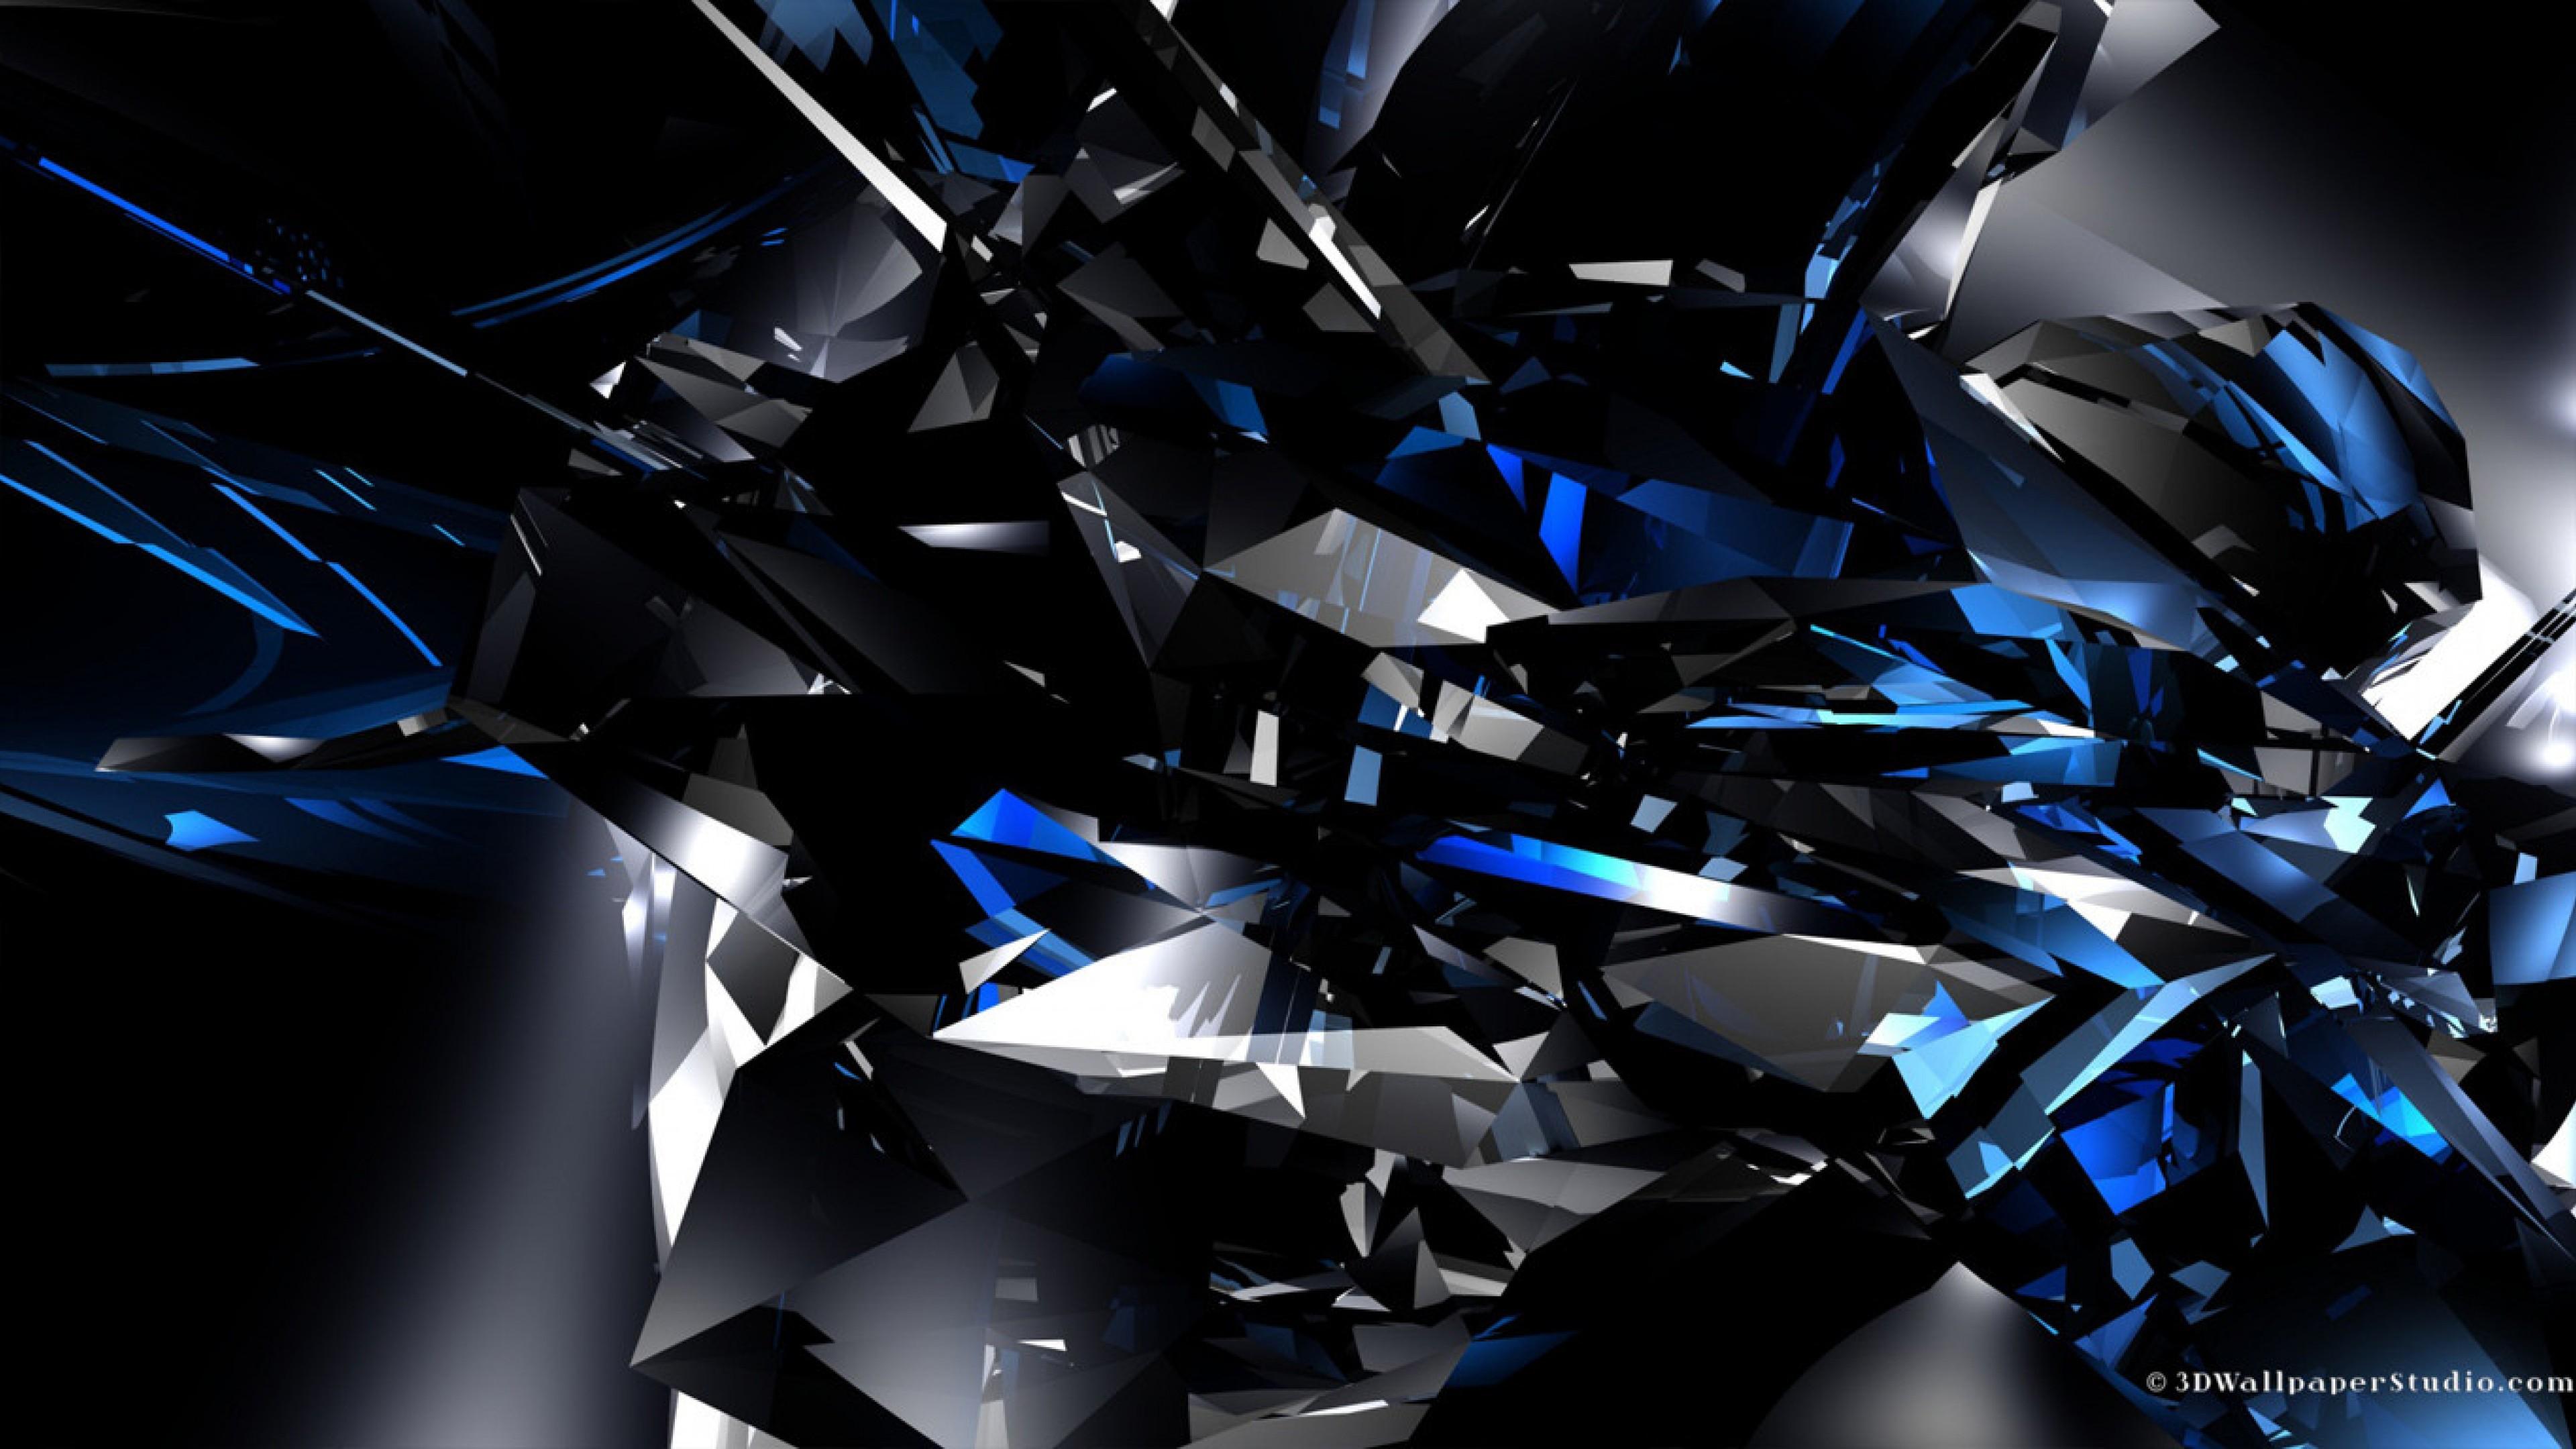 Crystal Lake Black And Blue Hd Wallpaper 4k Ultra Hd Hd Wallpaper Wallpapers Net